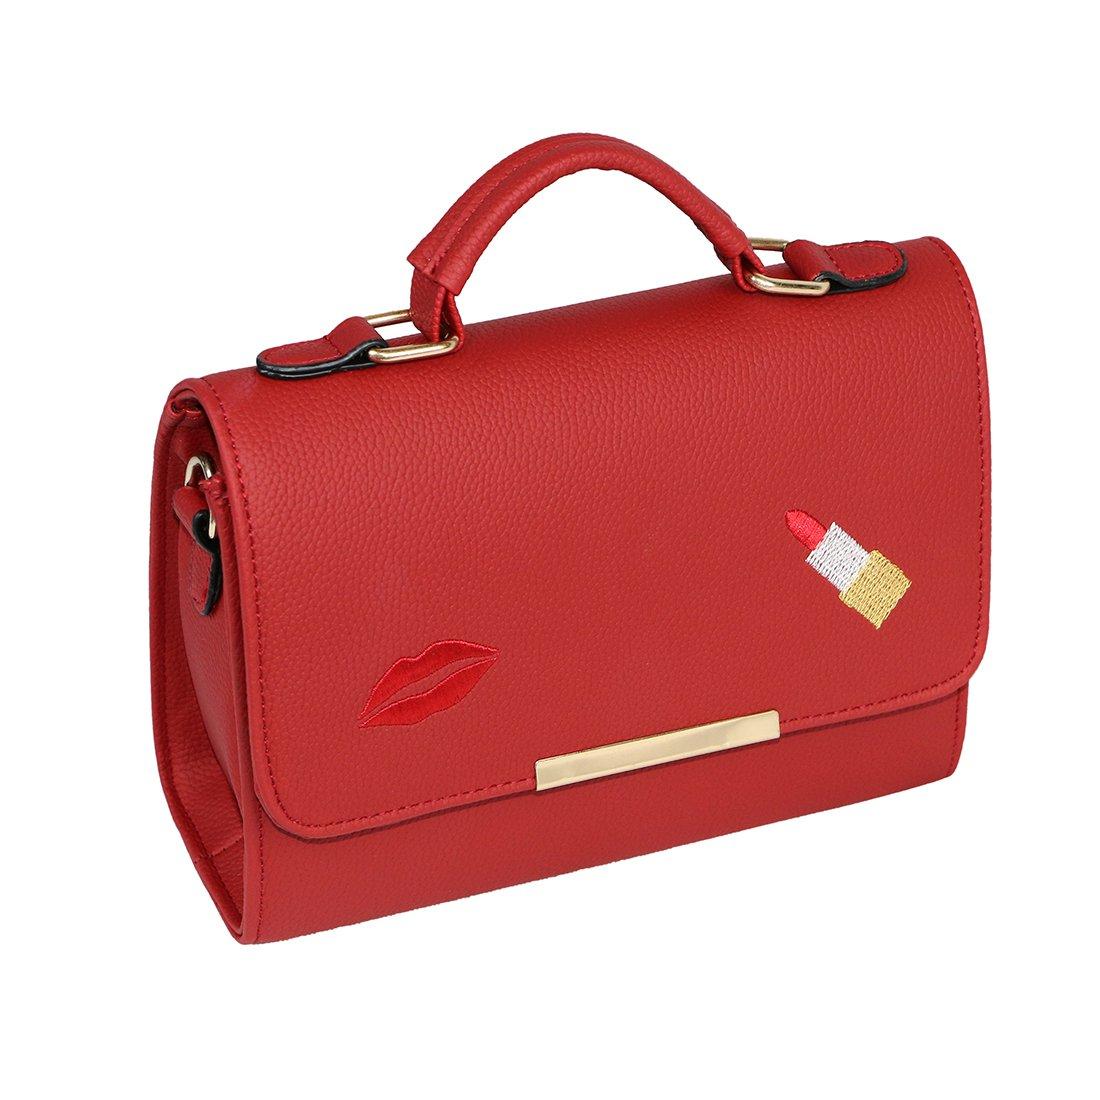 Mini Handbags for Women, ladies Fashion Shoulder Bag Jelly Crossbody Bags,Top Handle Satchel Purse